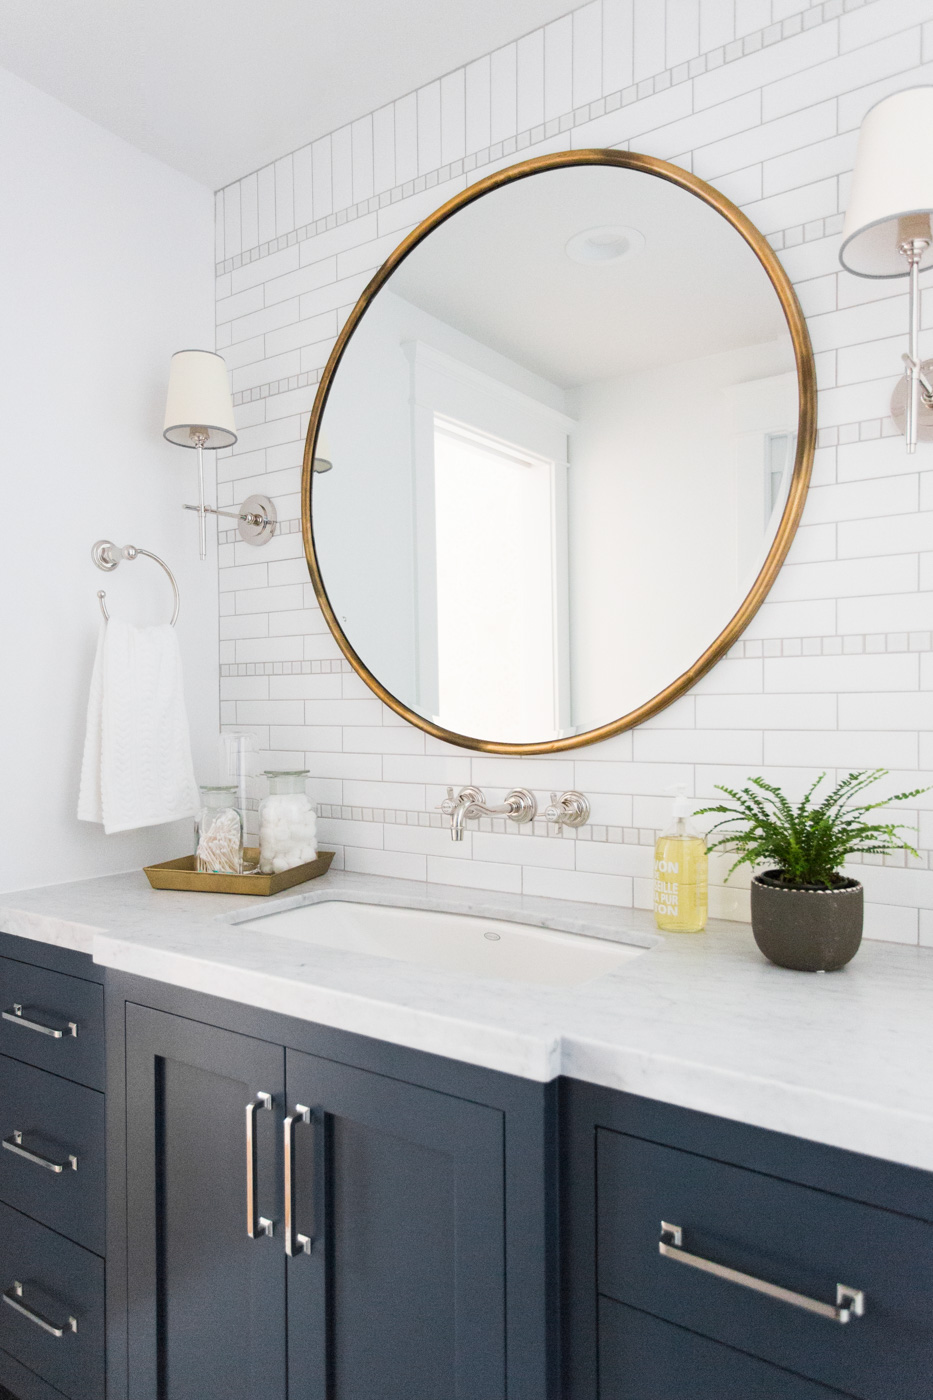 Circle mirror against white tile backsplash